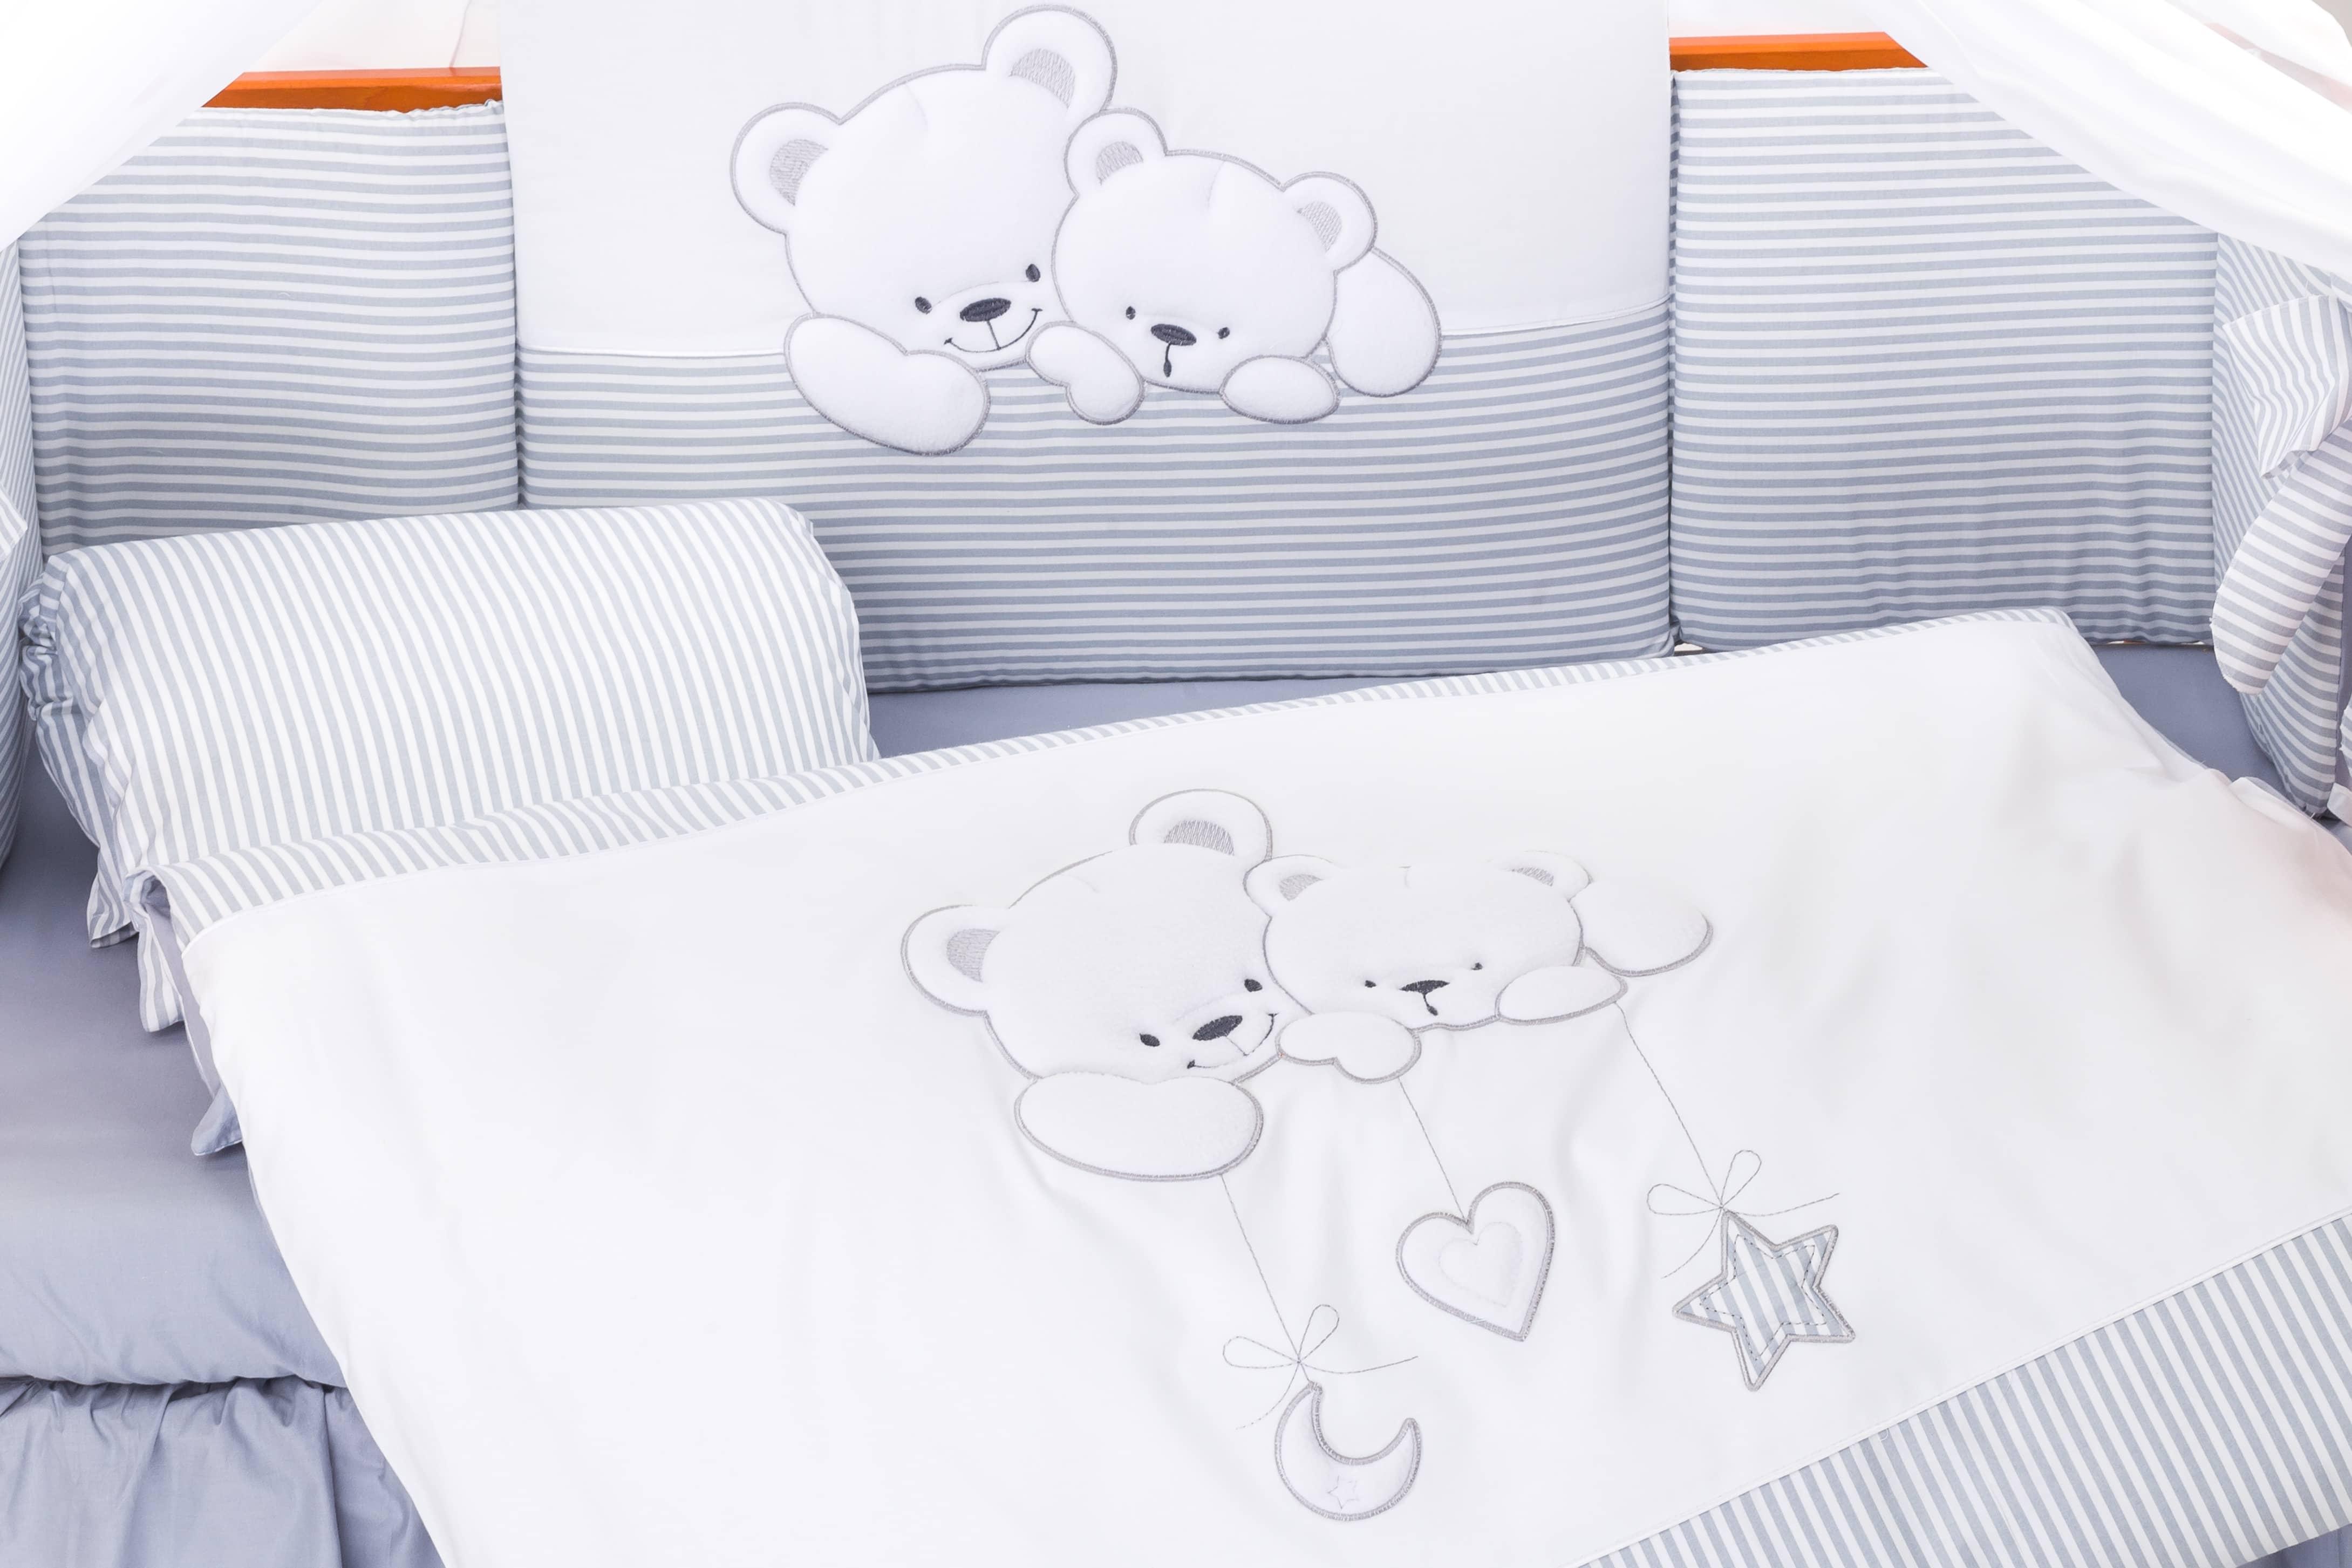 Voodipesukomplekt Cuddle Bear 21